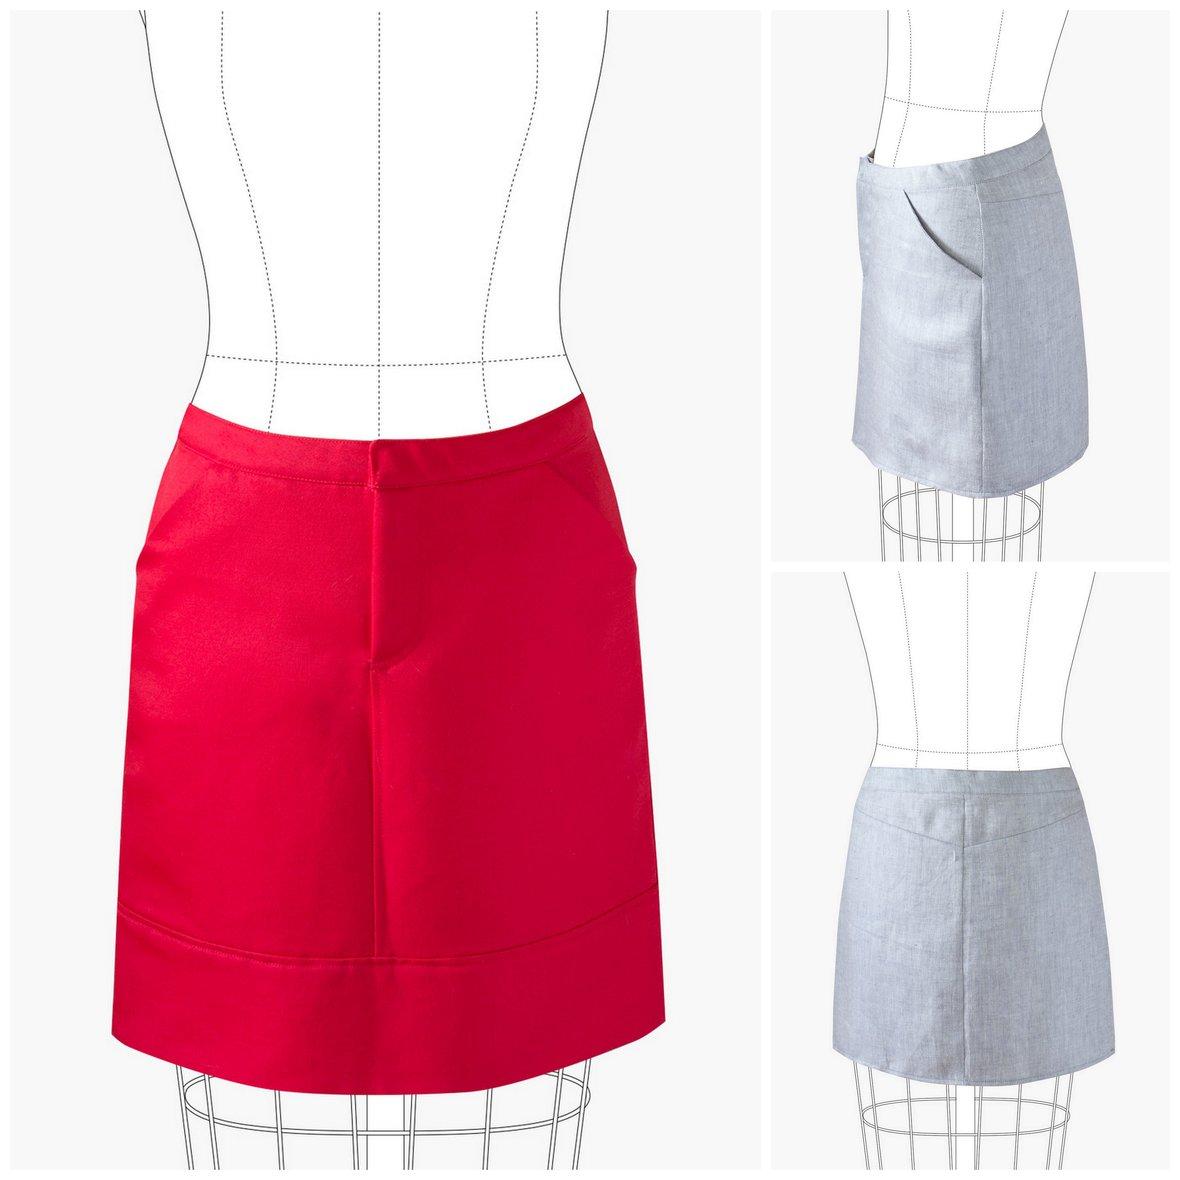 grainline studio  moss skirt sewing pattern